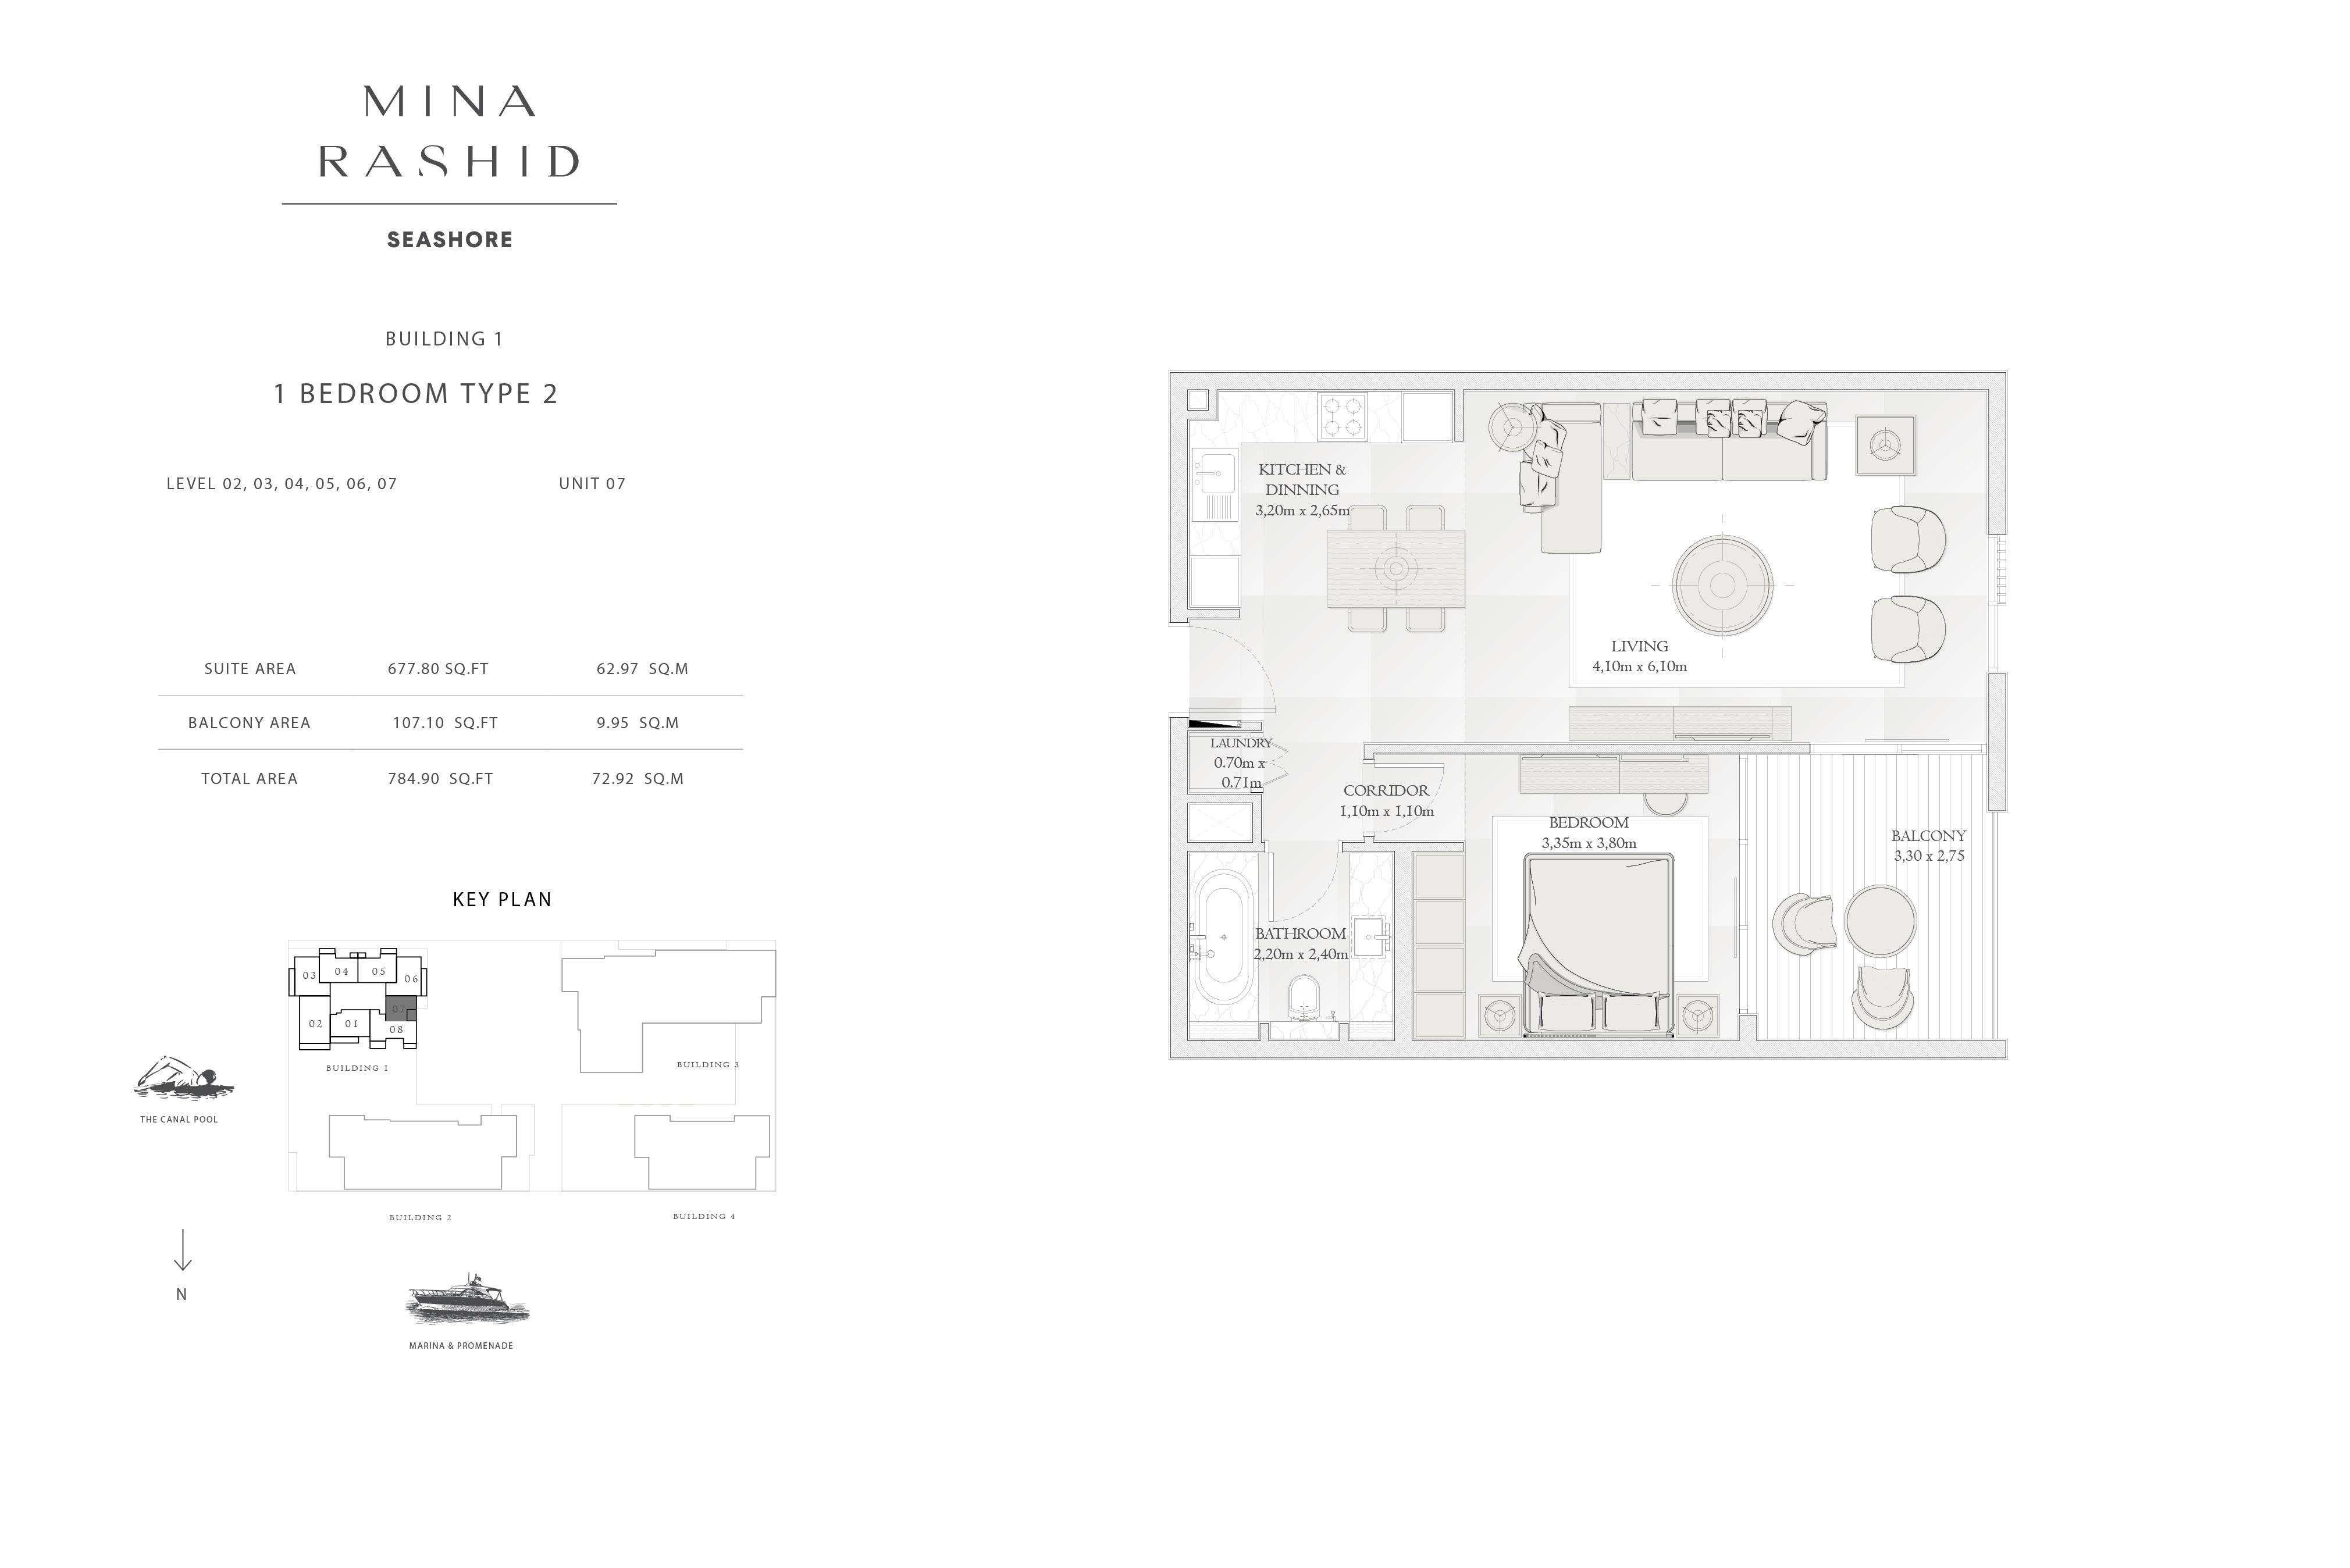 Building-1, 1-Bedroom-Type-2, Size-784-Sq Ft